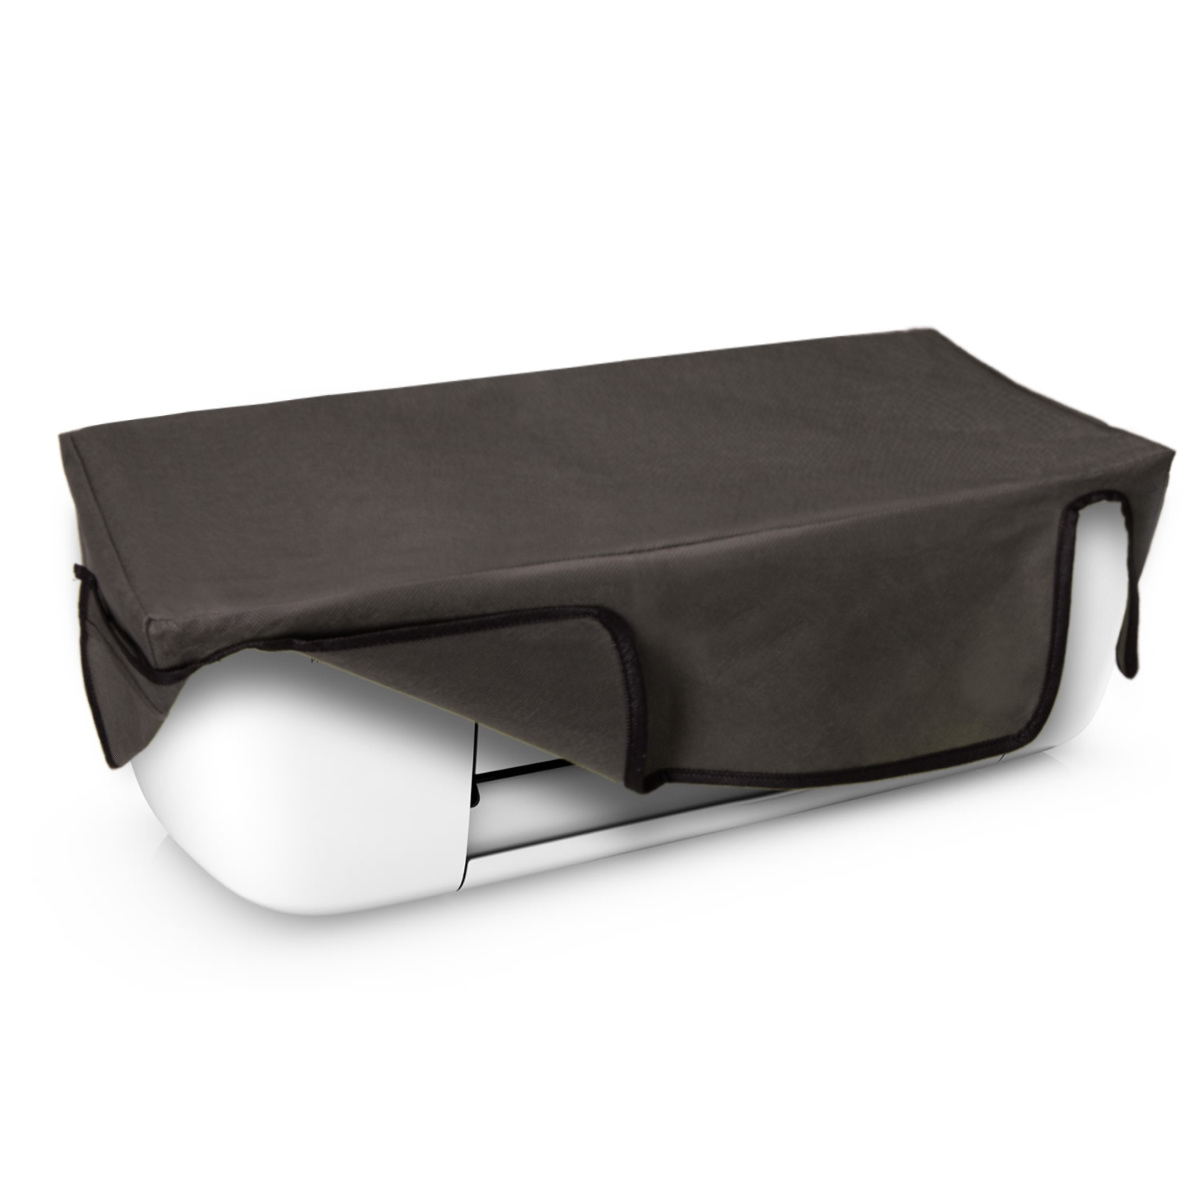 KW Κάλυμμα Εκτυπωτή HP DeskJet 3720 - Dark Grey (49779.19)